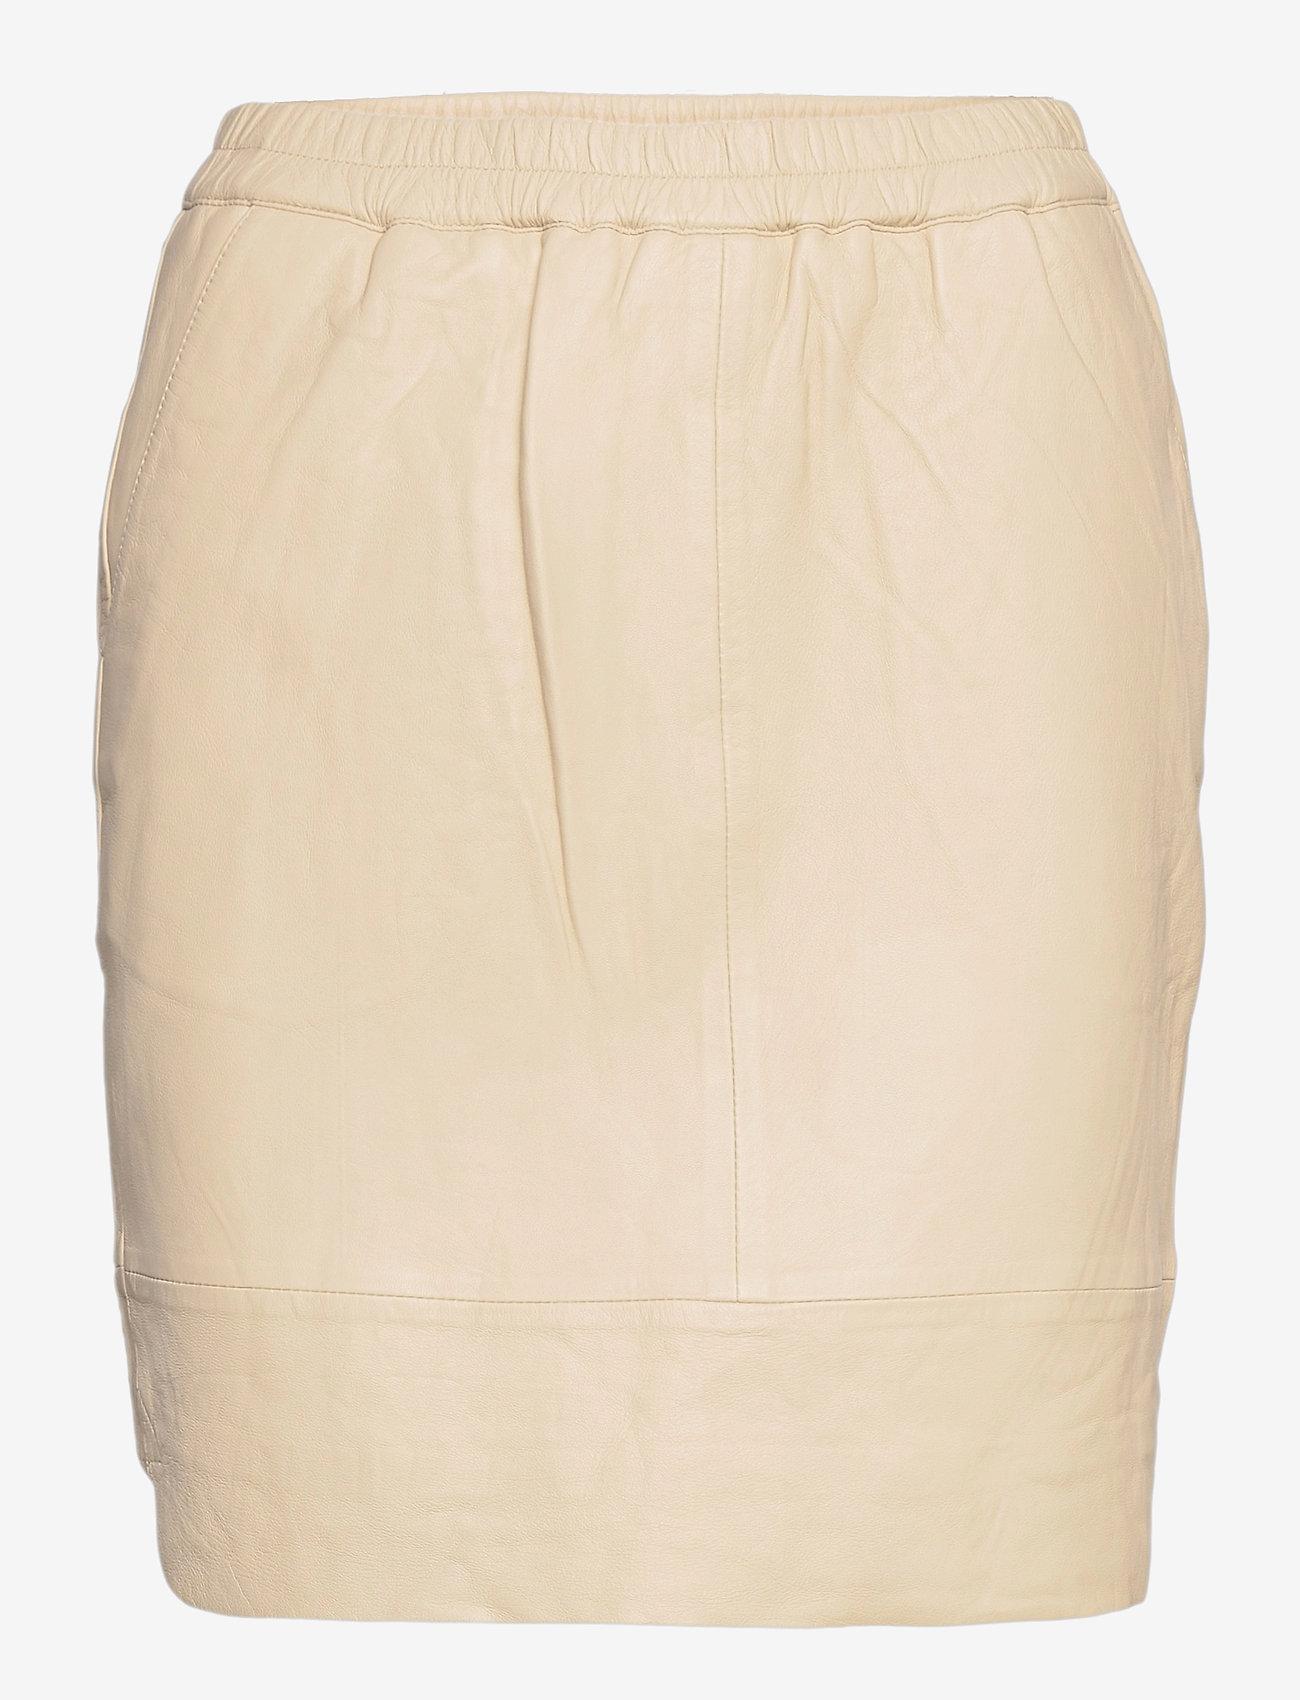 Coster Copenhagen - CC Heart leather skirt (B4514) - korta kjolar - cold cream - 0